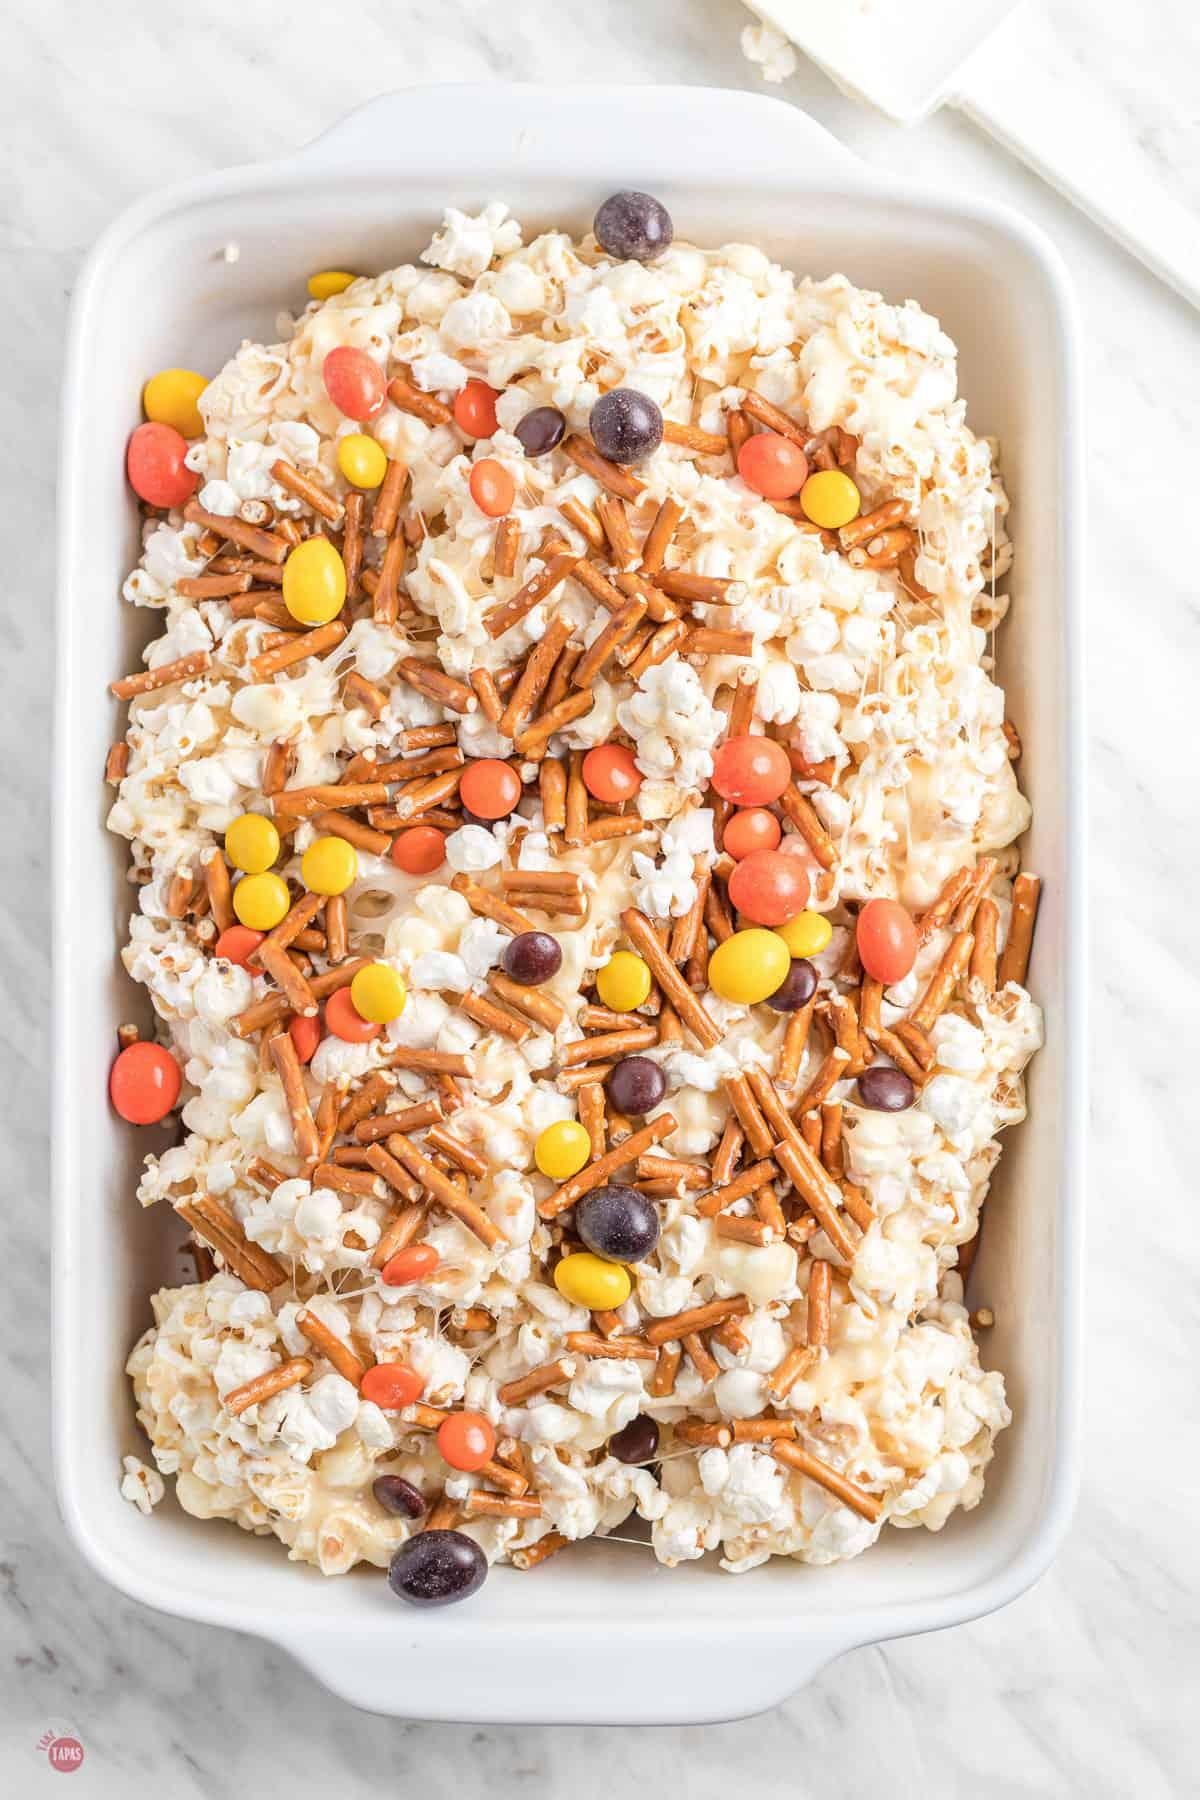 popcorn with pretzels